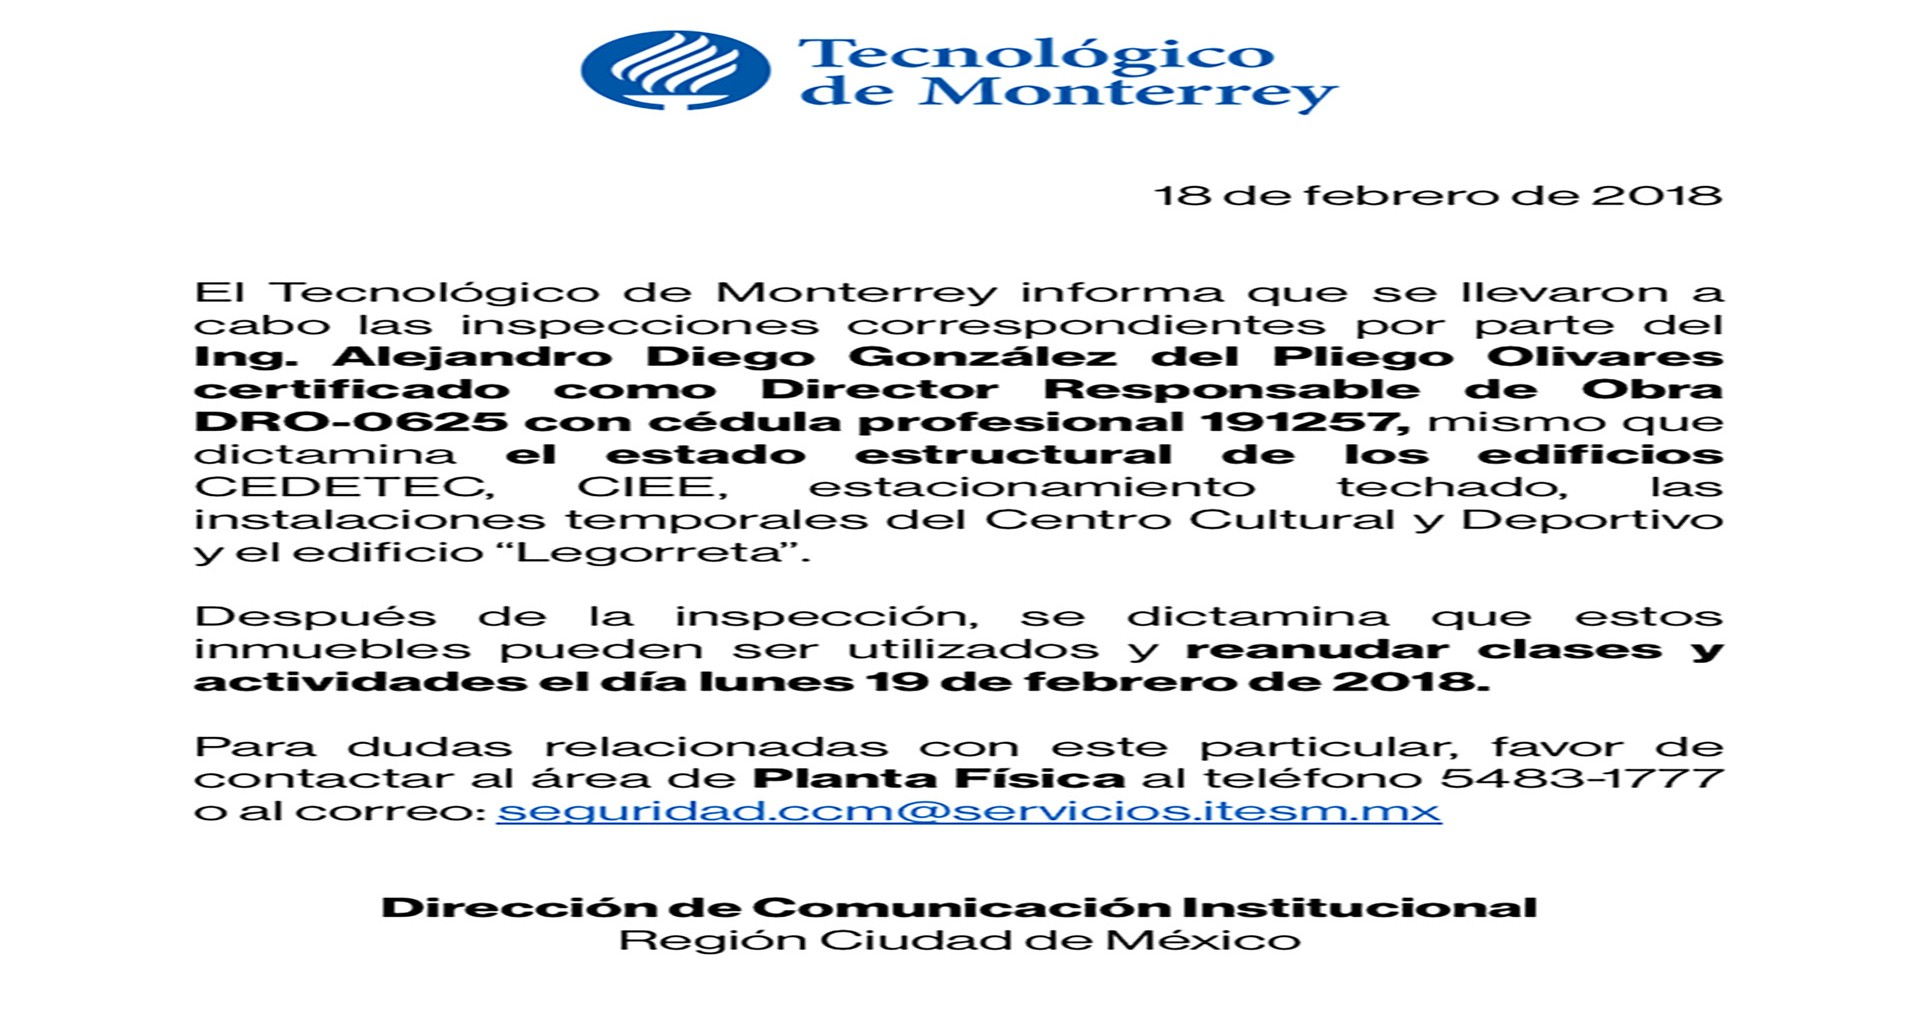 Comunicado reanudación de clases | Tecnológico de Monterrey